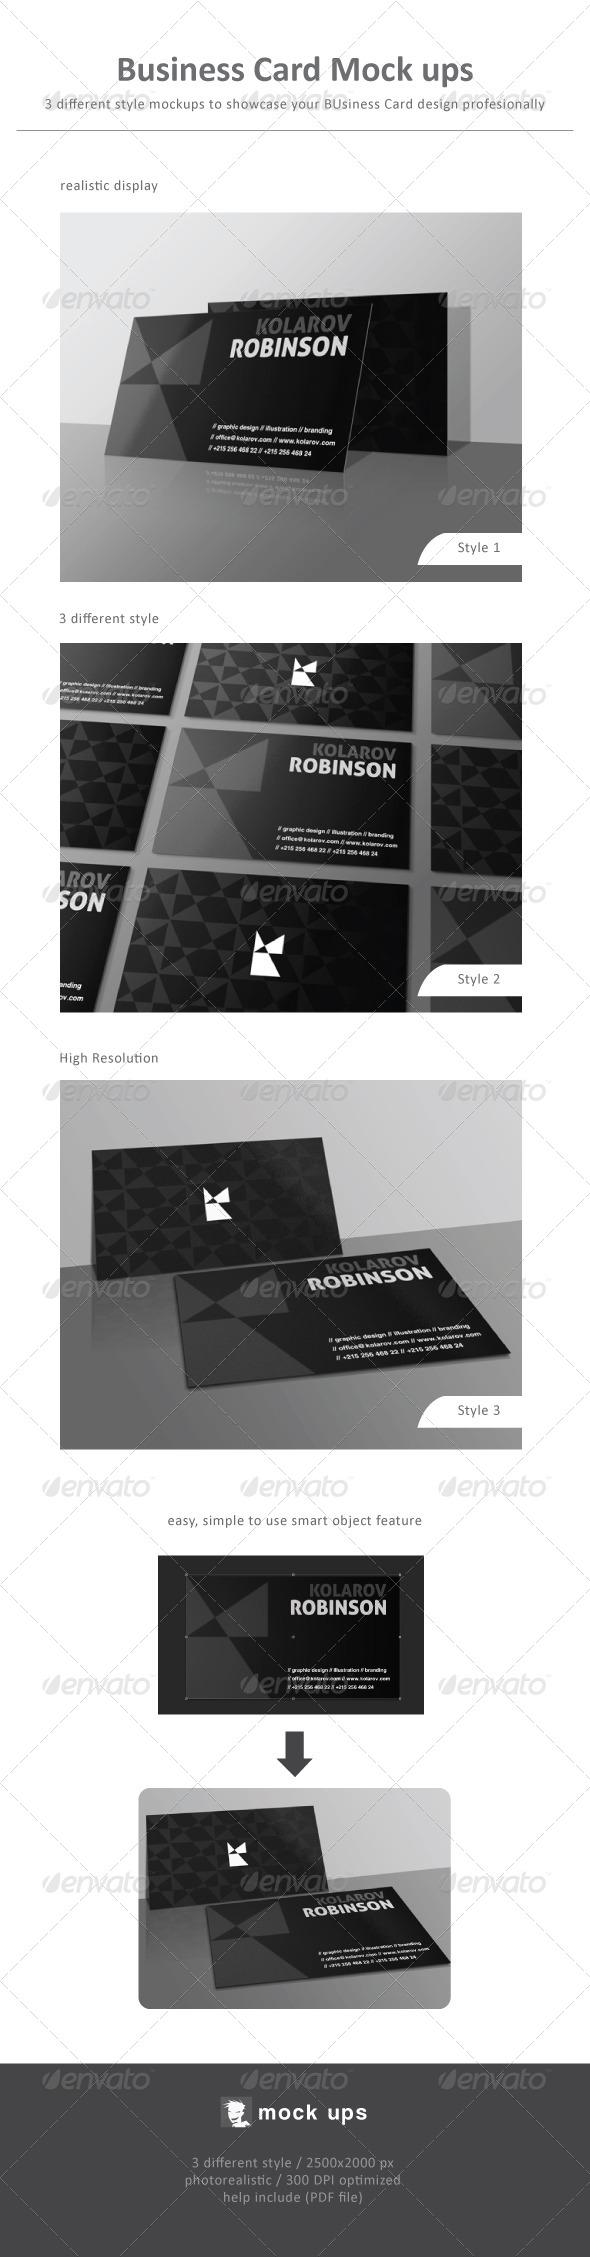 Business Card Mock Ups - Business Cards Print